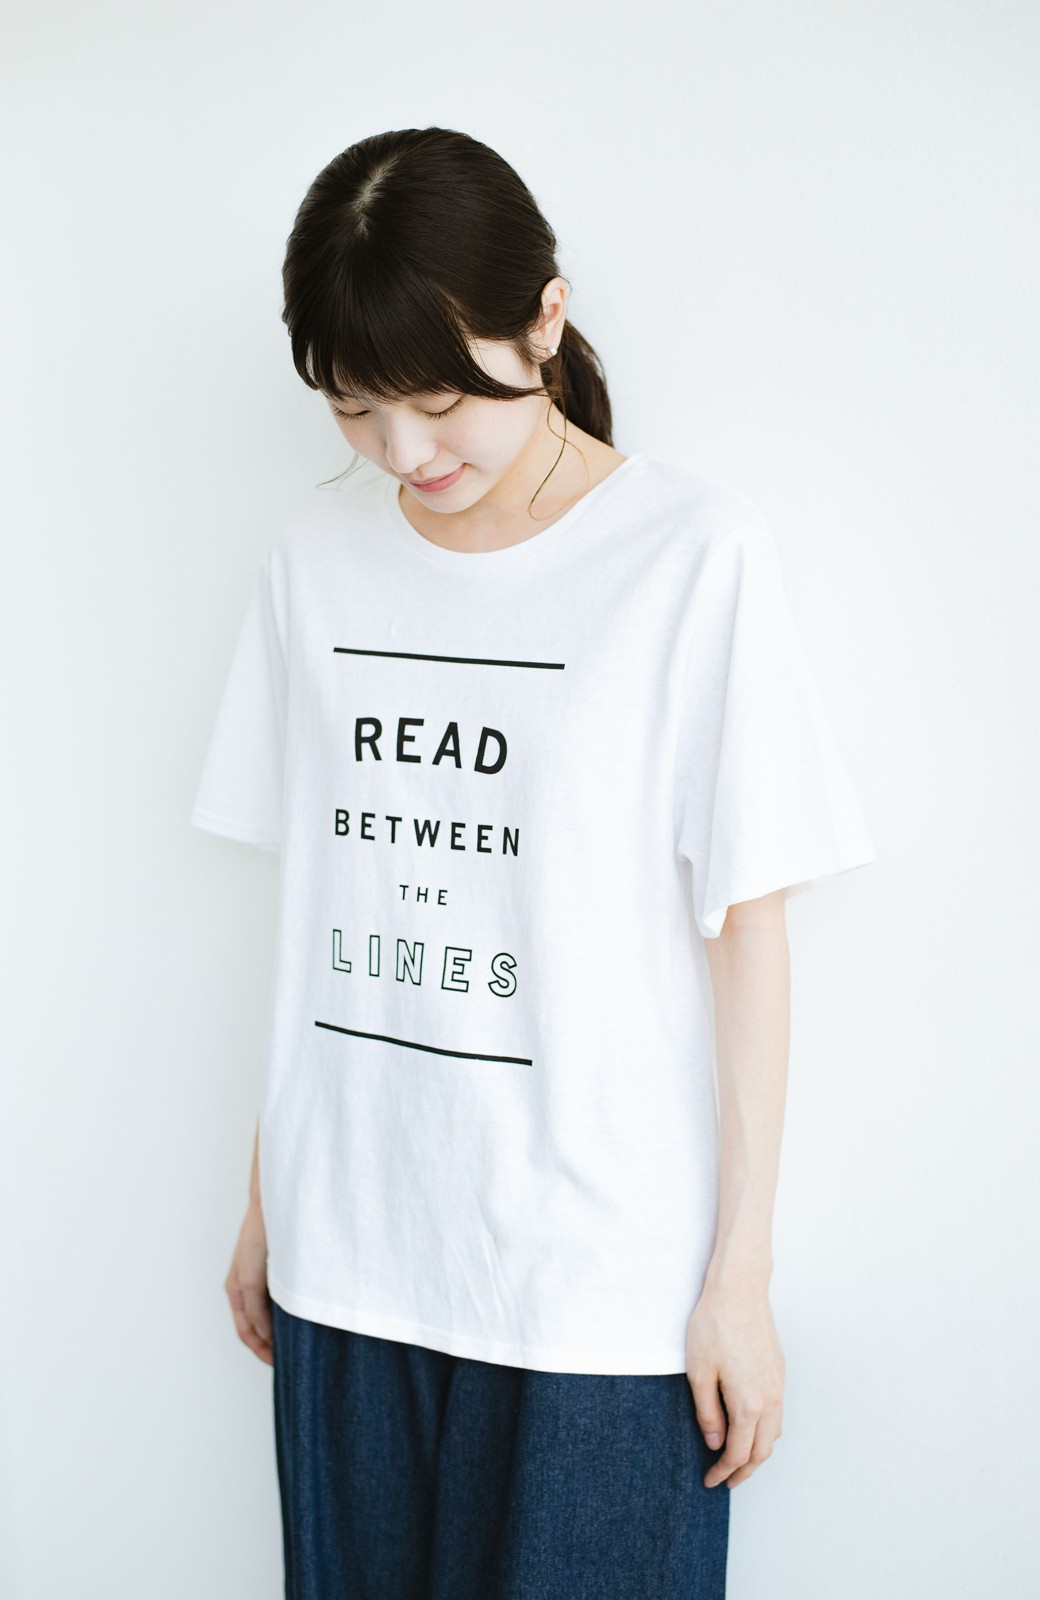 haco! 女の子バンザイ!プロジェクト【毎日いろいろあるのよ】PBPオーガニックコットンの女子の気持ちを察してほしいよTシャツ <ホワイト>の商品写真7